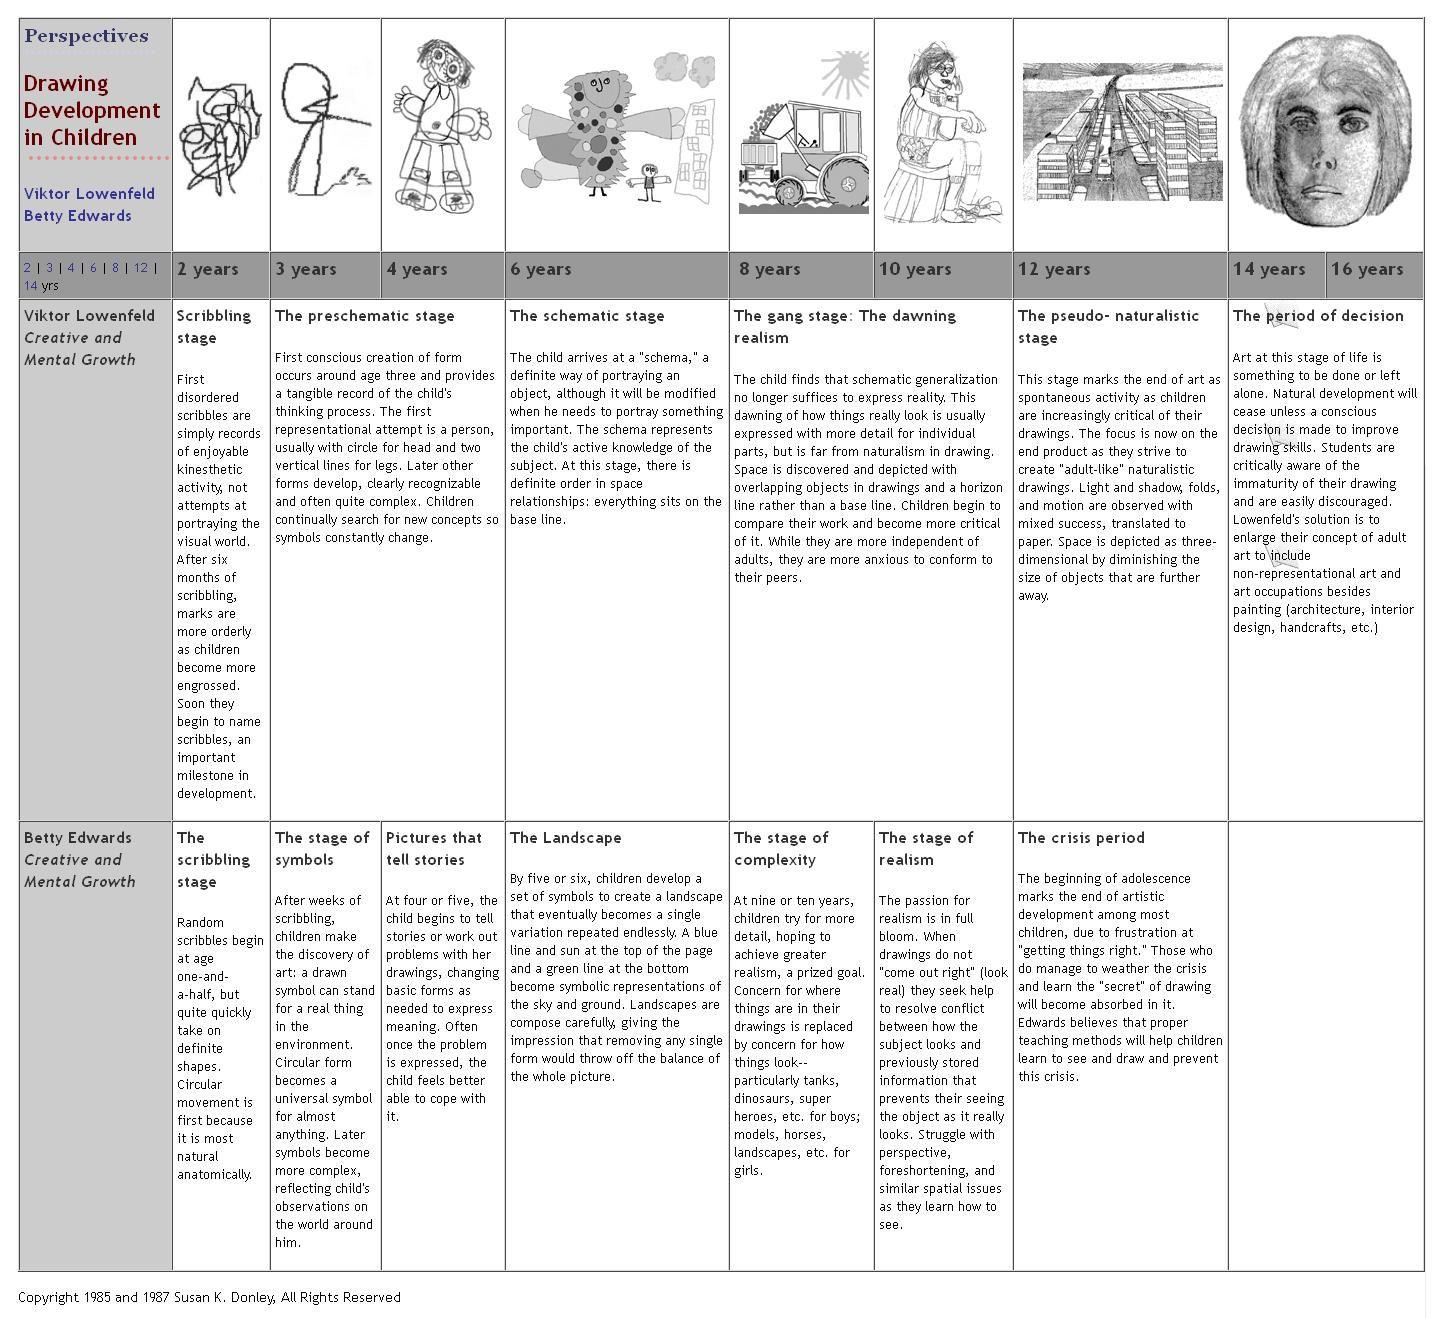 A Very Helpful Chart To Help Teachers Parents And Kids Understand The Development Of Children